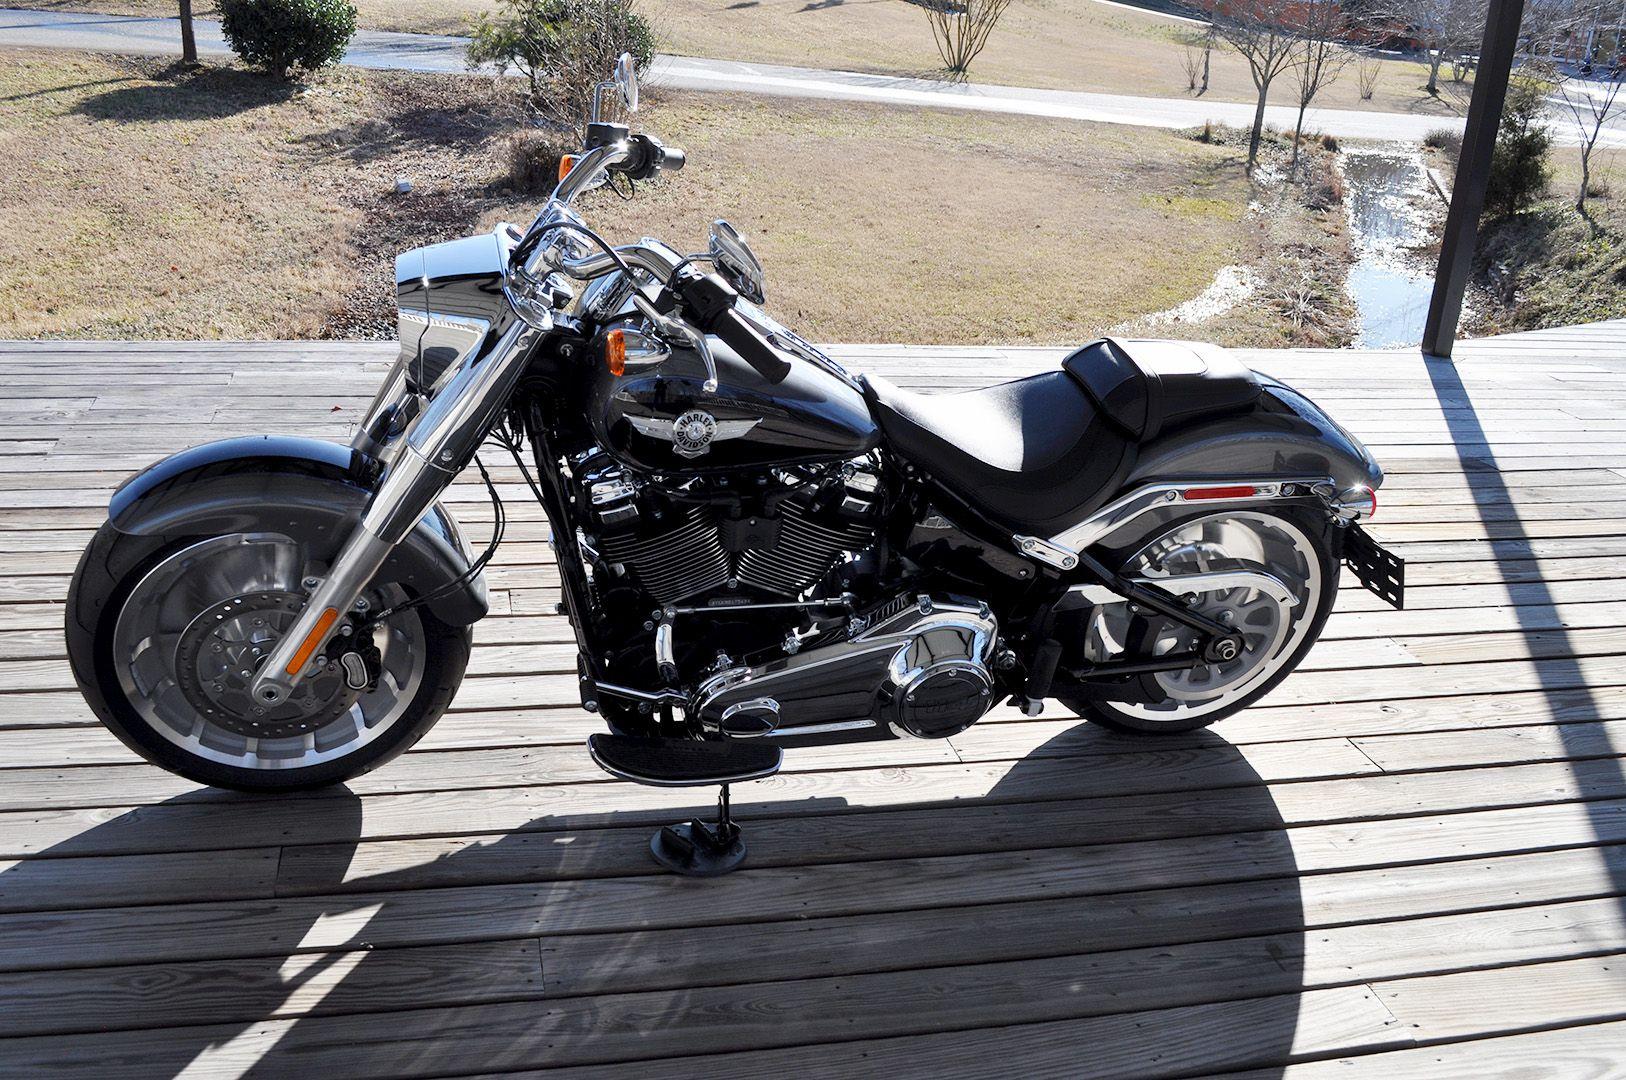 New 2021 Harley-Davidson Fat Boy 114